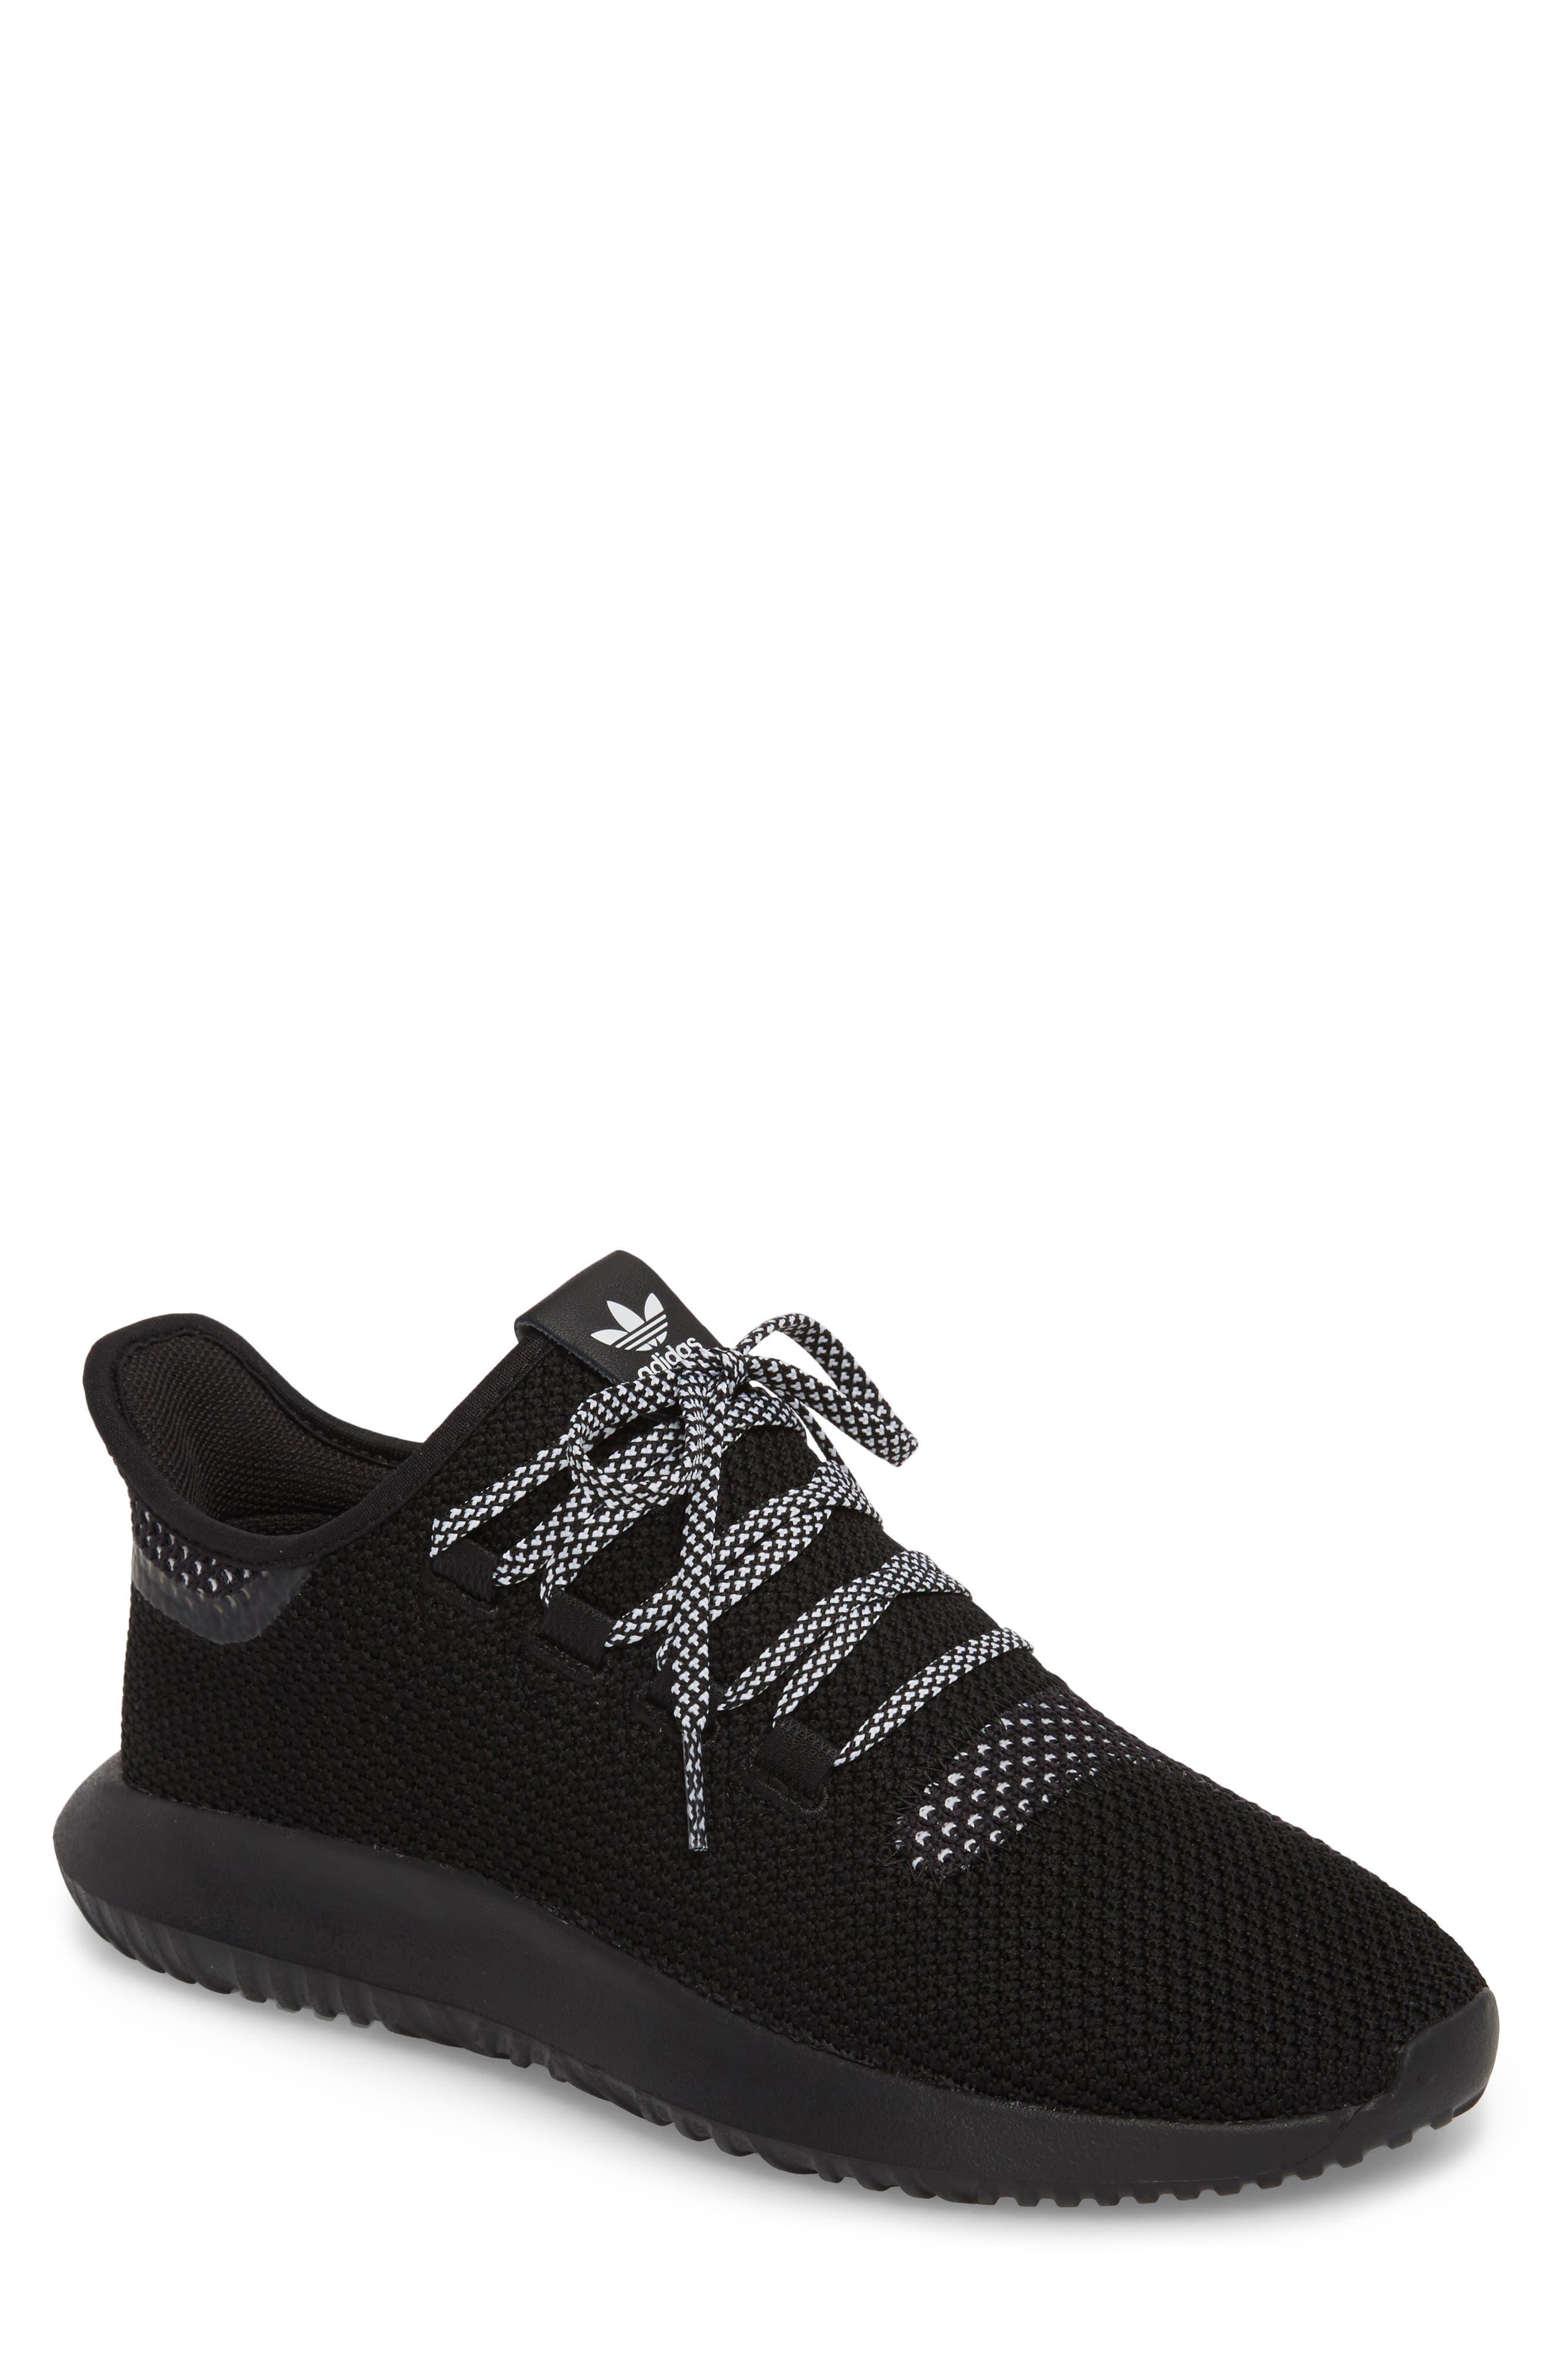 Alternate Image 1 Selected - adidas Tubular Shadow CK Sneaker (Men)